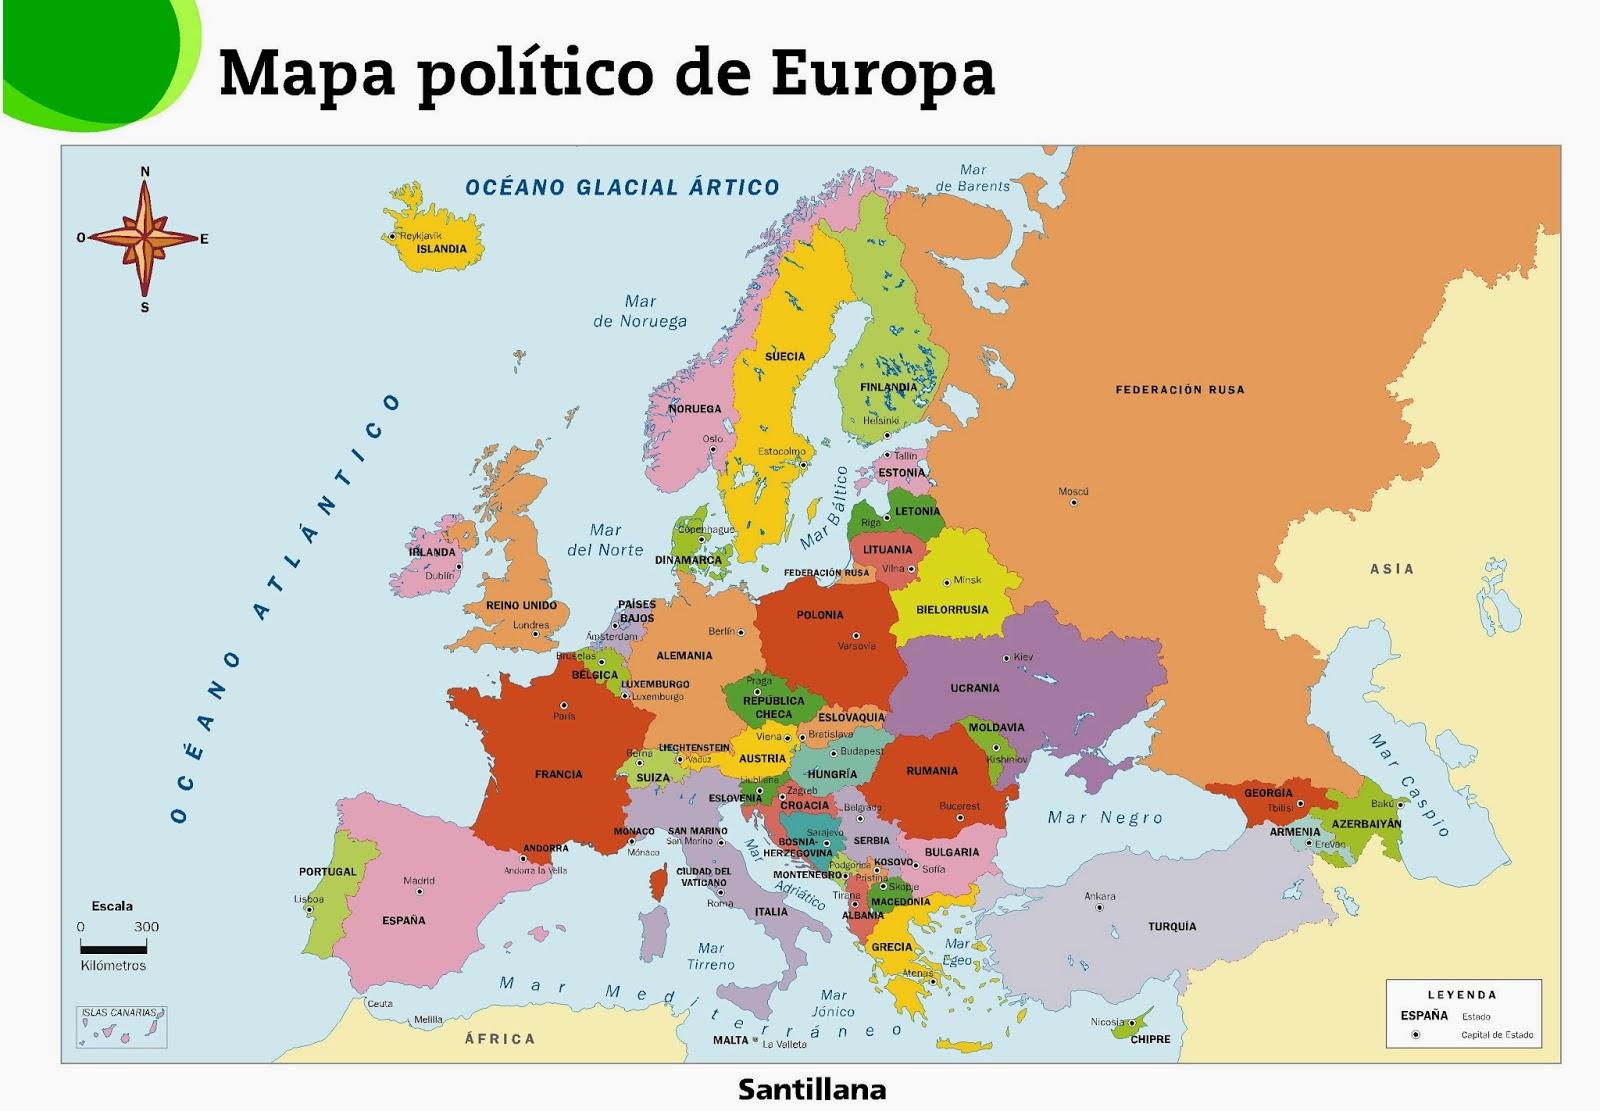 http://serbal.pntic.mec.es/ealg0027/mapasflasheus.htm